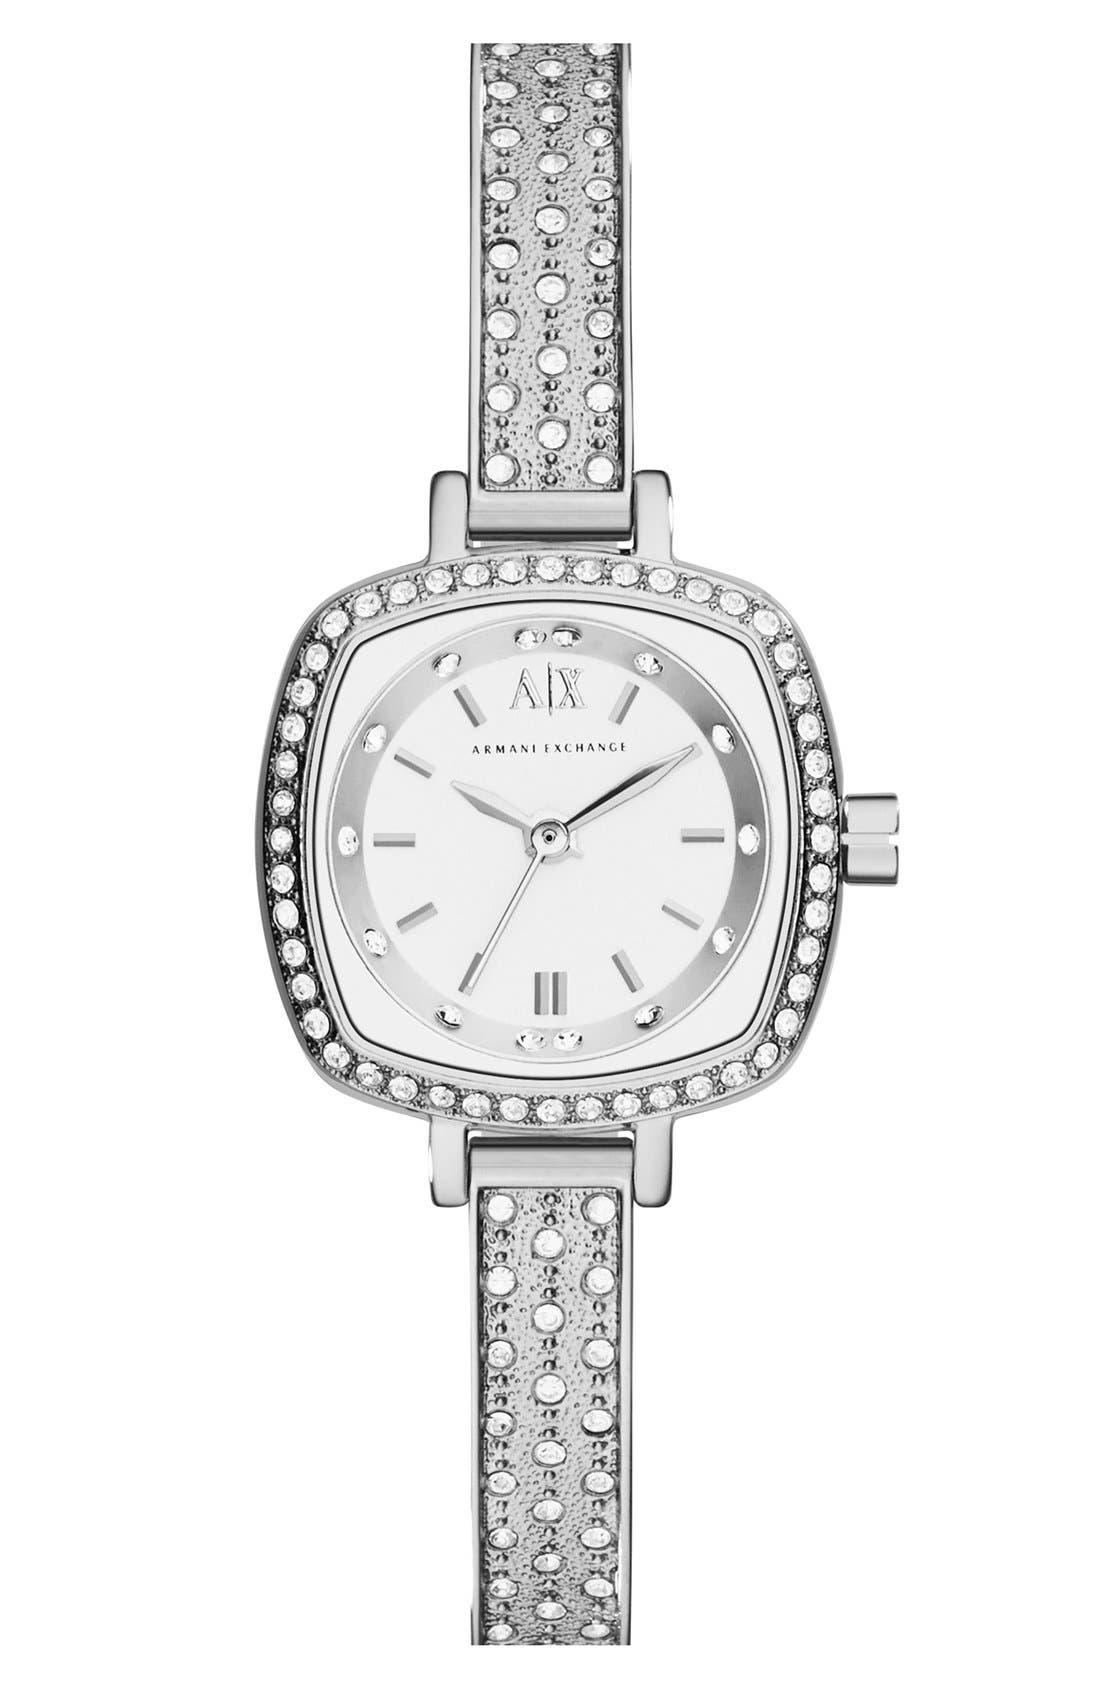 Main Image - AX Armani Exchange Crystal Encrusted Bangle Watch, 22mm